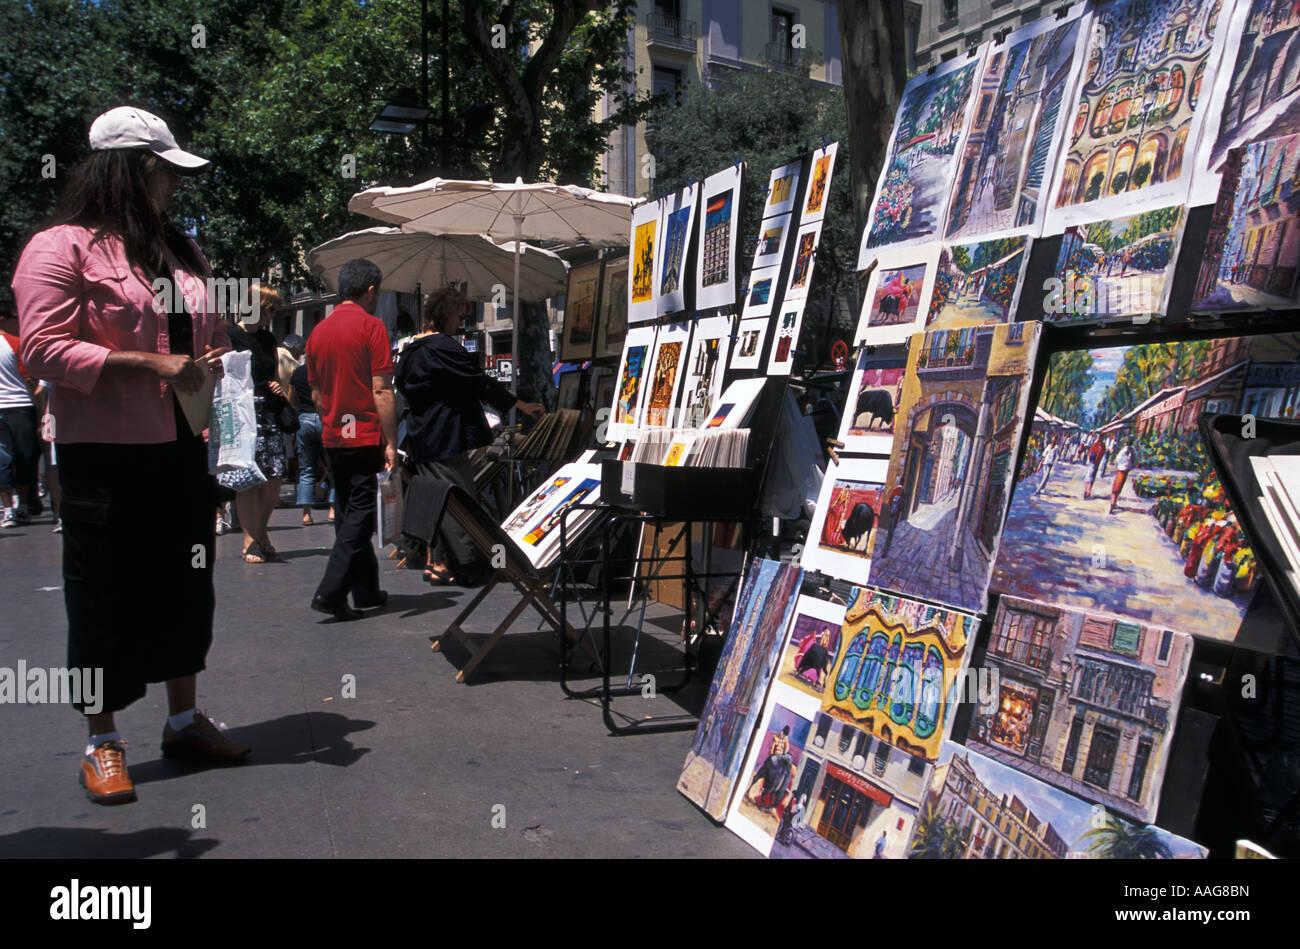 Galerie en plein air Las Ramblas Barcelona La Catalogne Espagne Banque D'Images